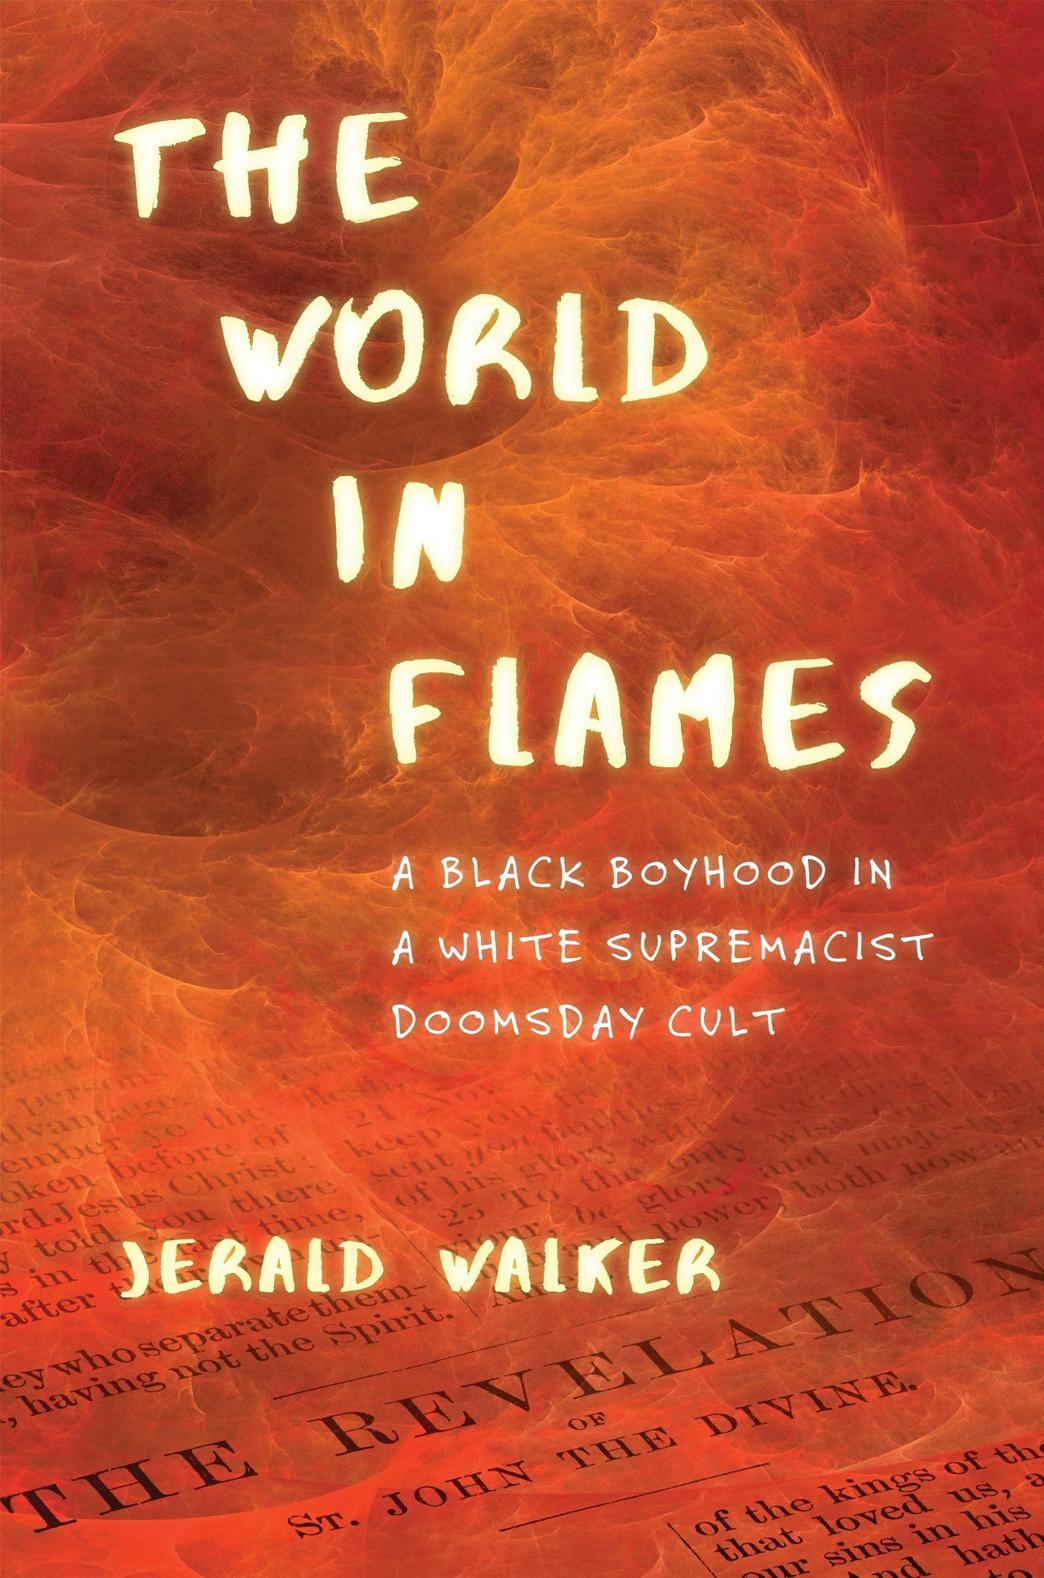 kathleen stone writer booklab literary salon the world in flames jerald walker